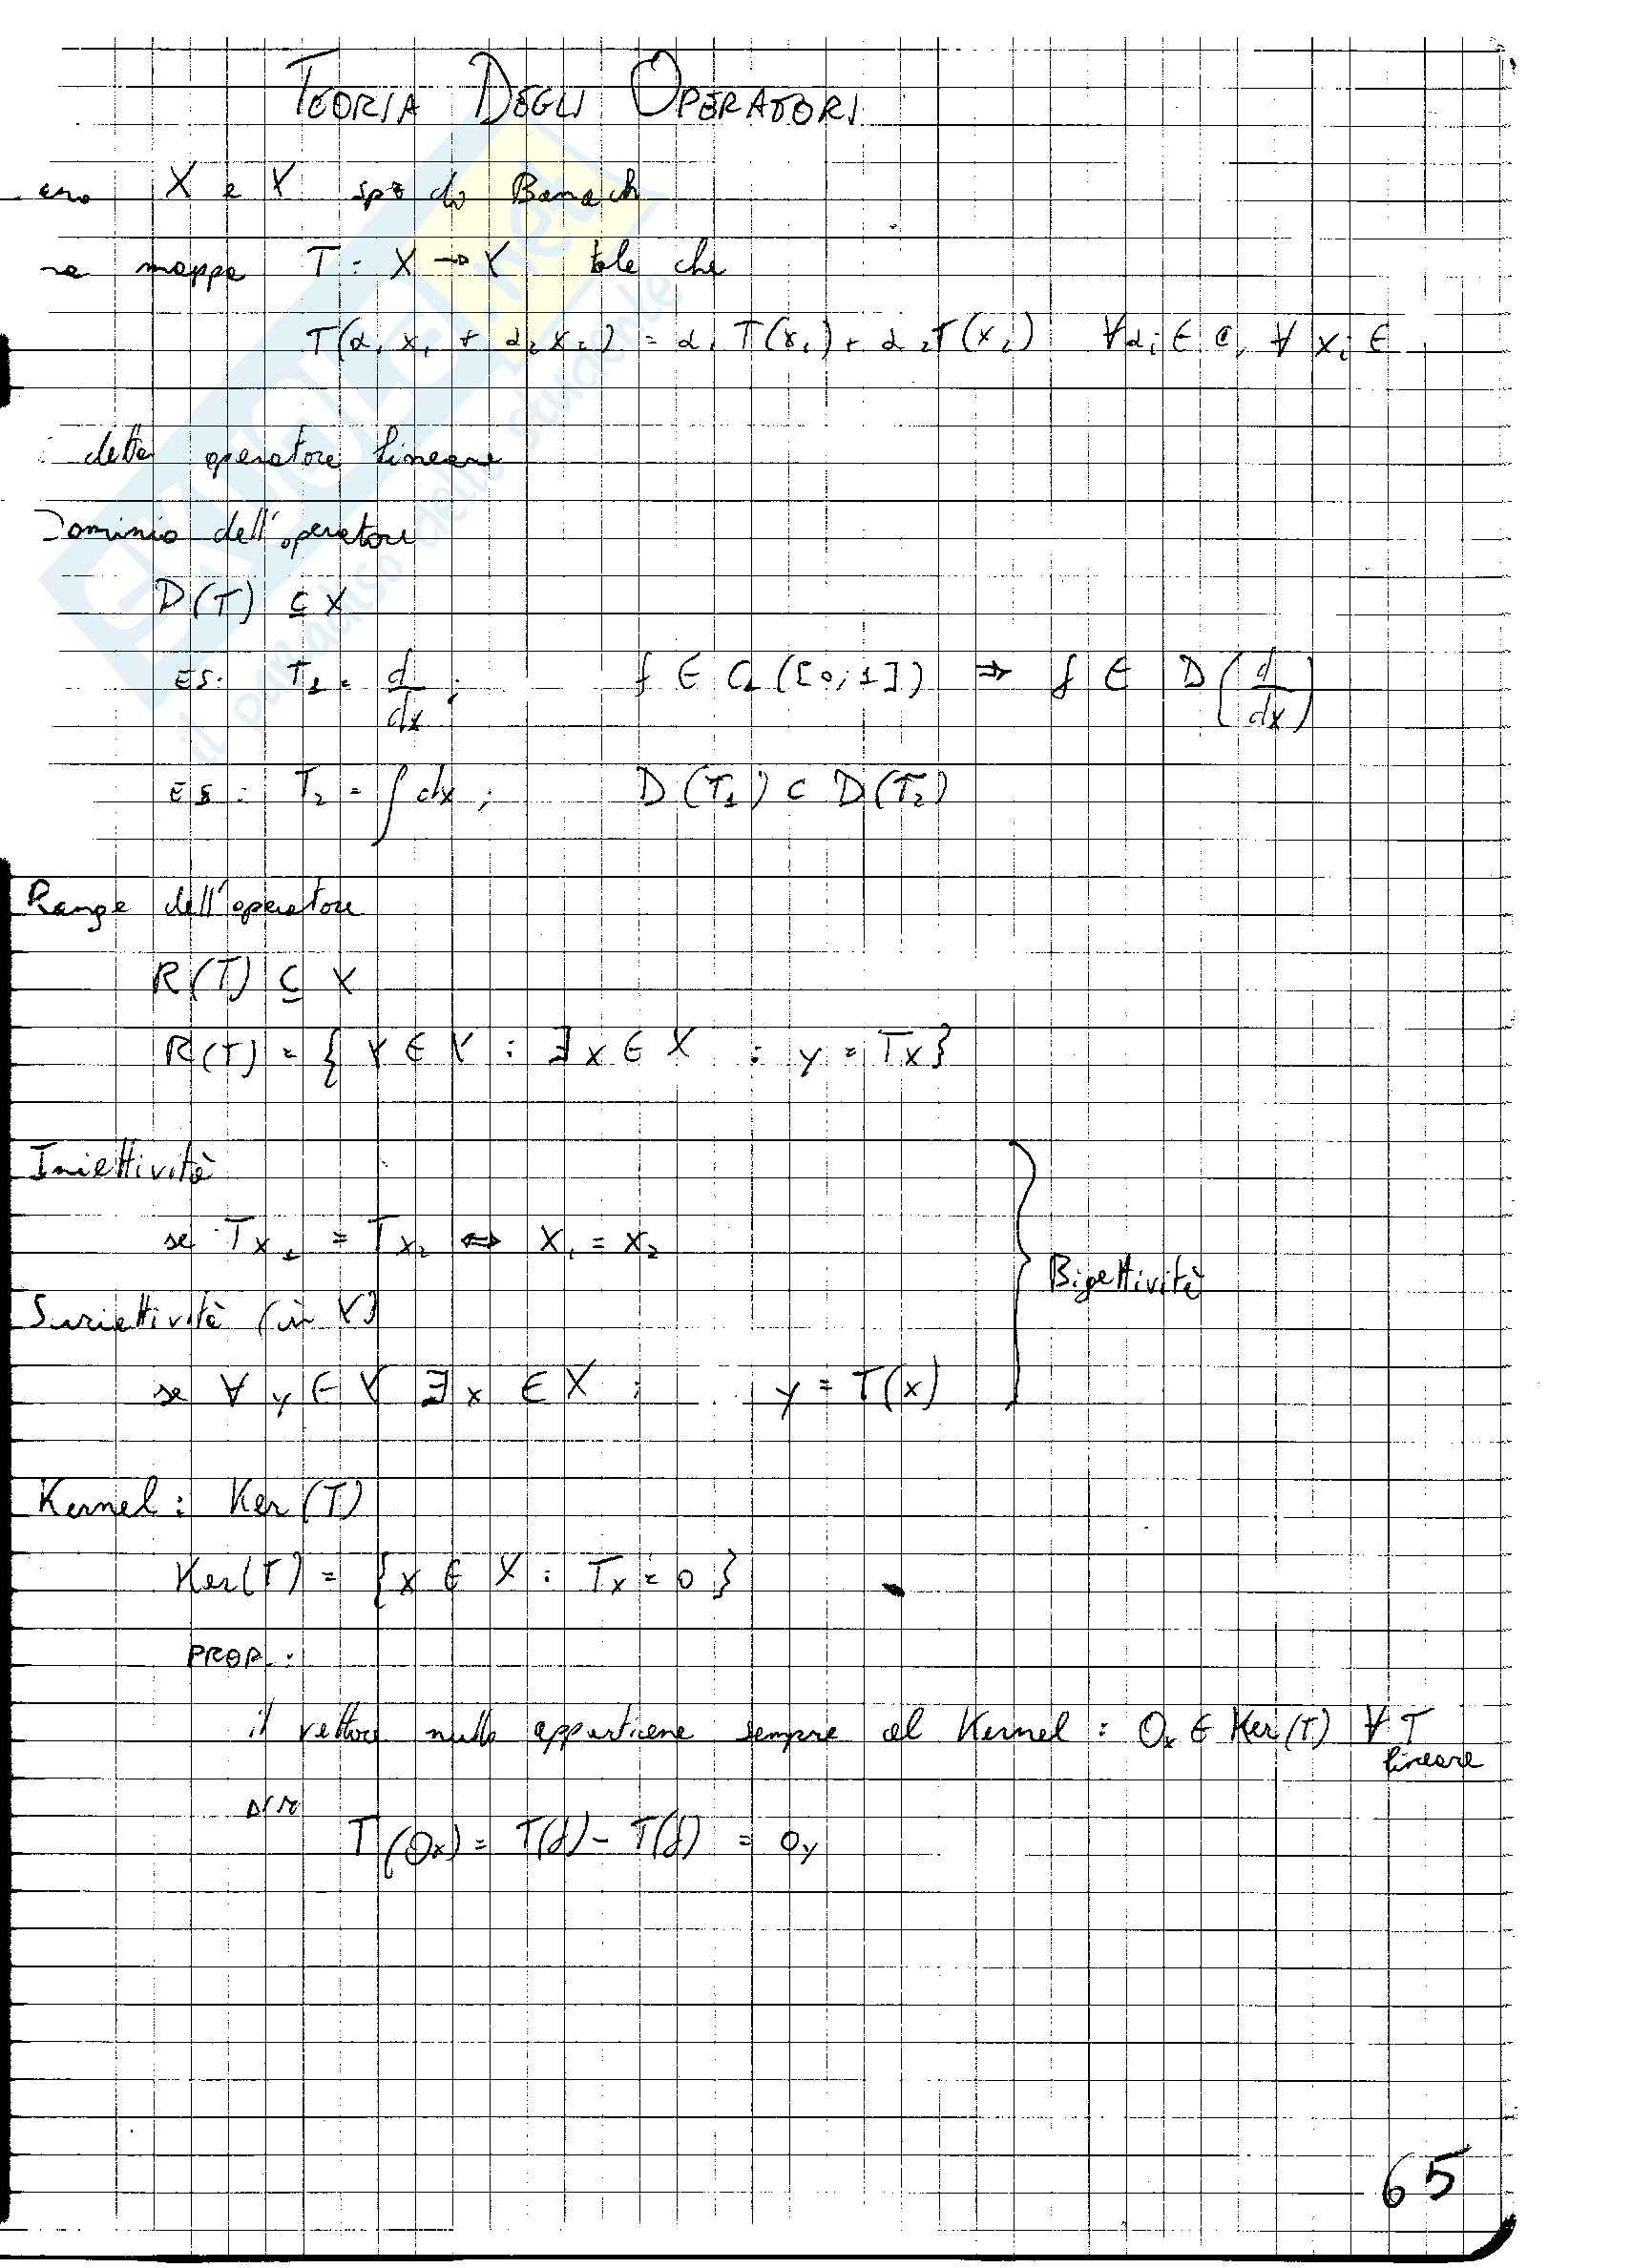 Fisica Matematica Pag. 66